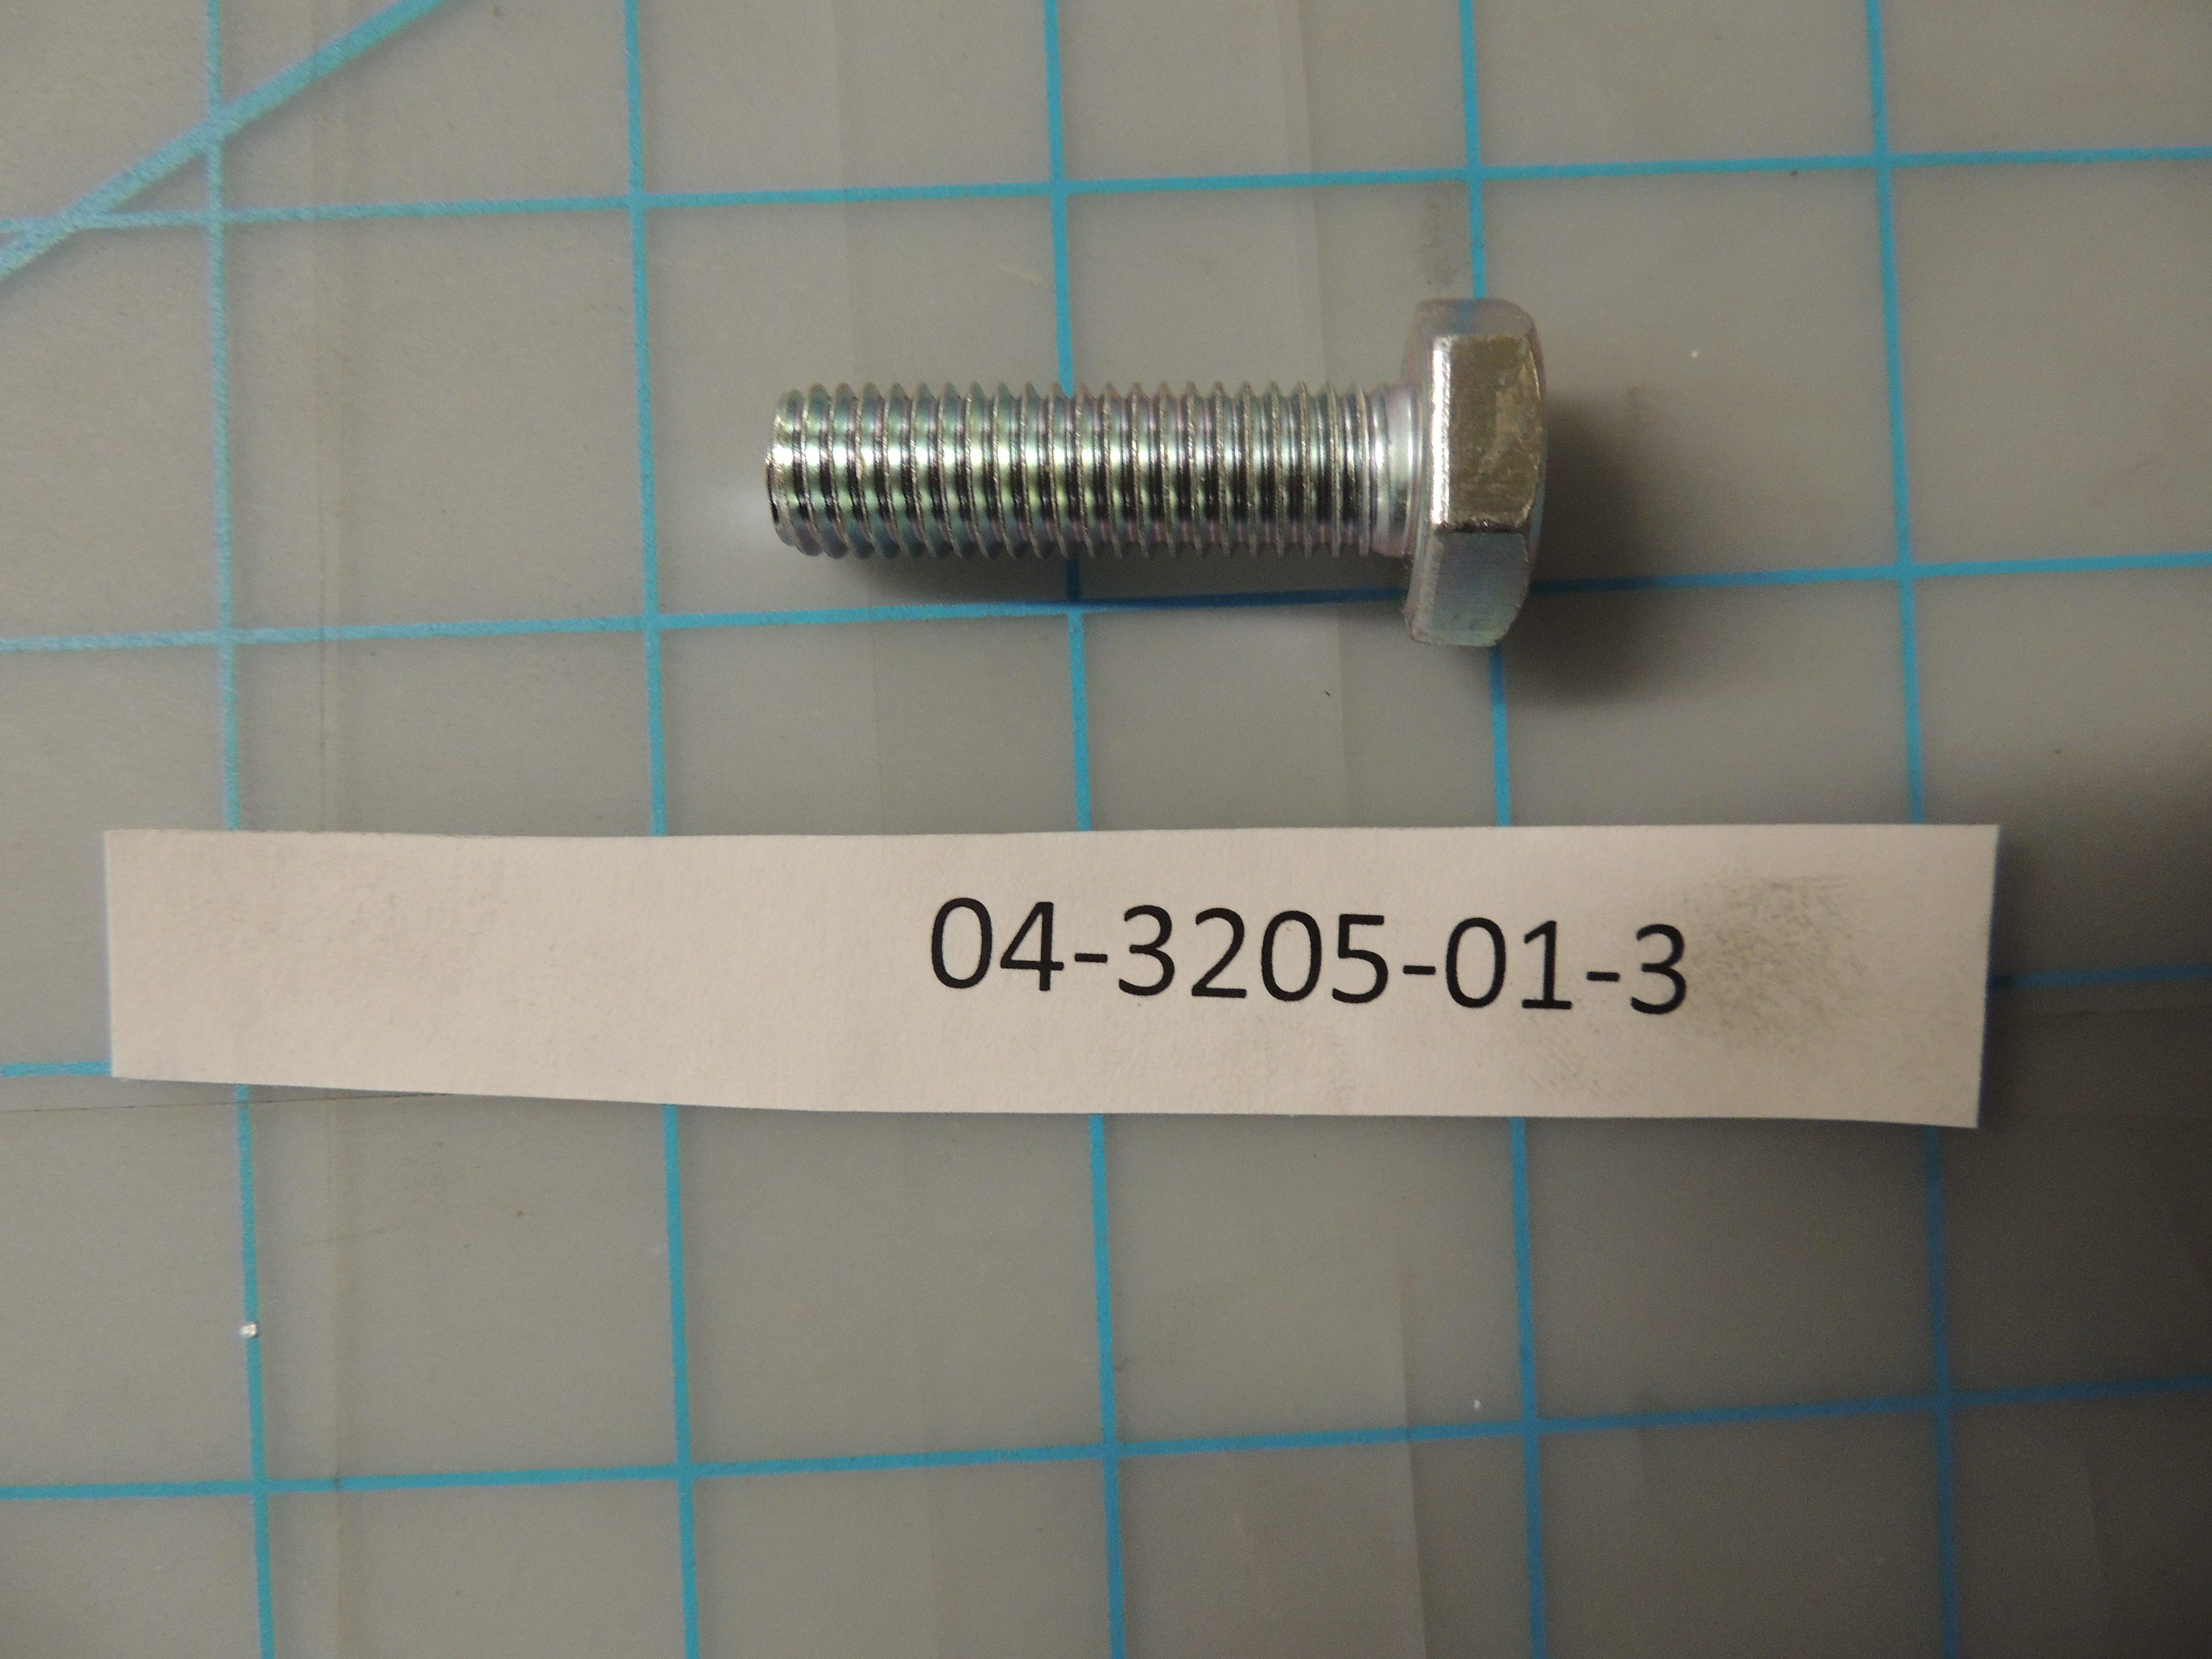 DPR2260 LEVELLING SCREW